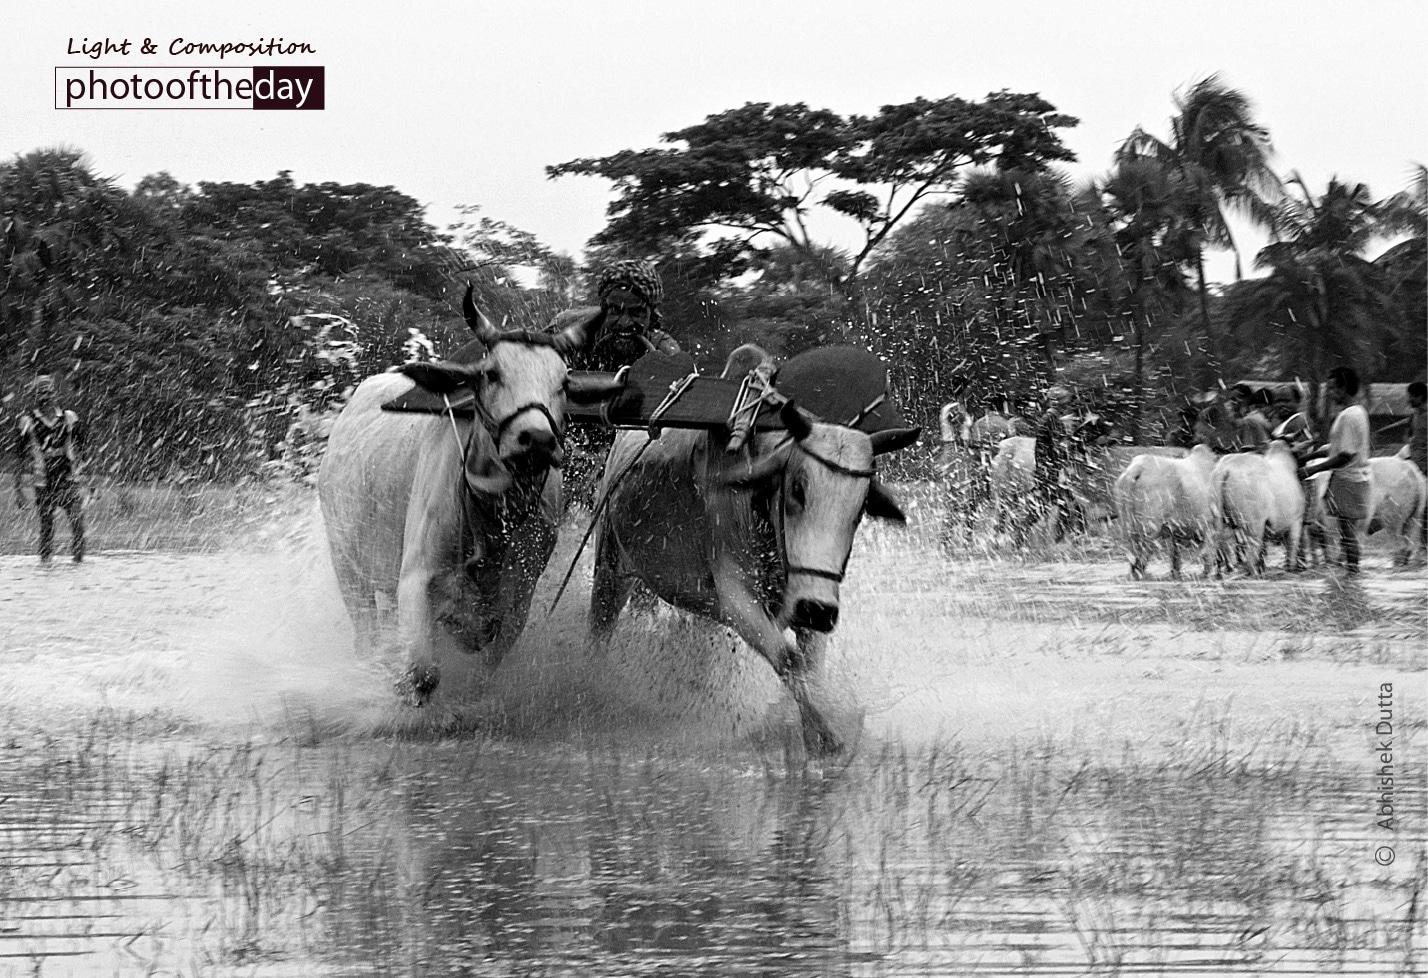 Bull Race, by Abhishek Dutta